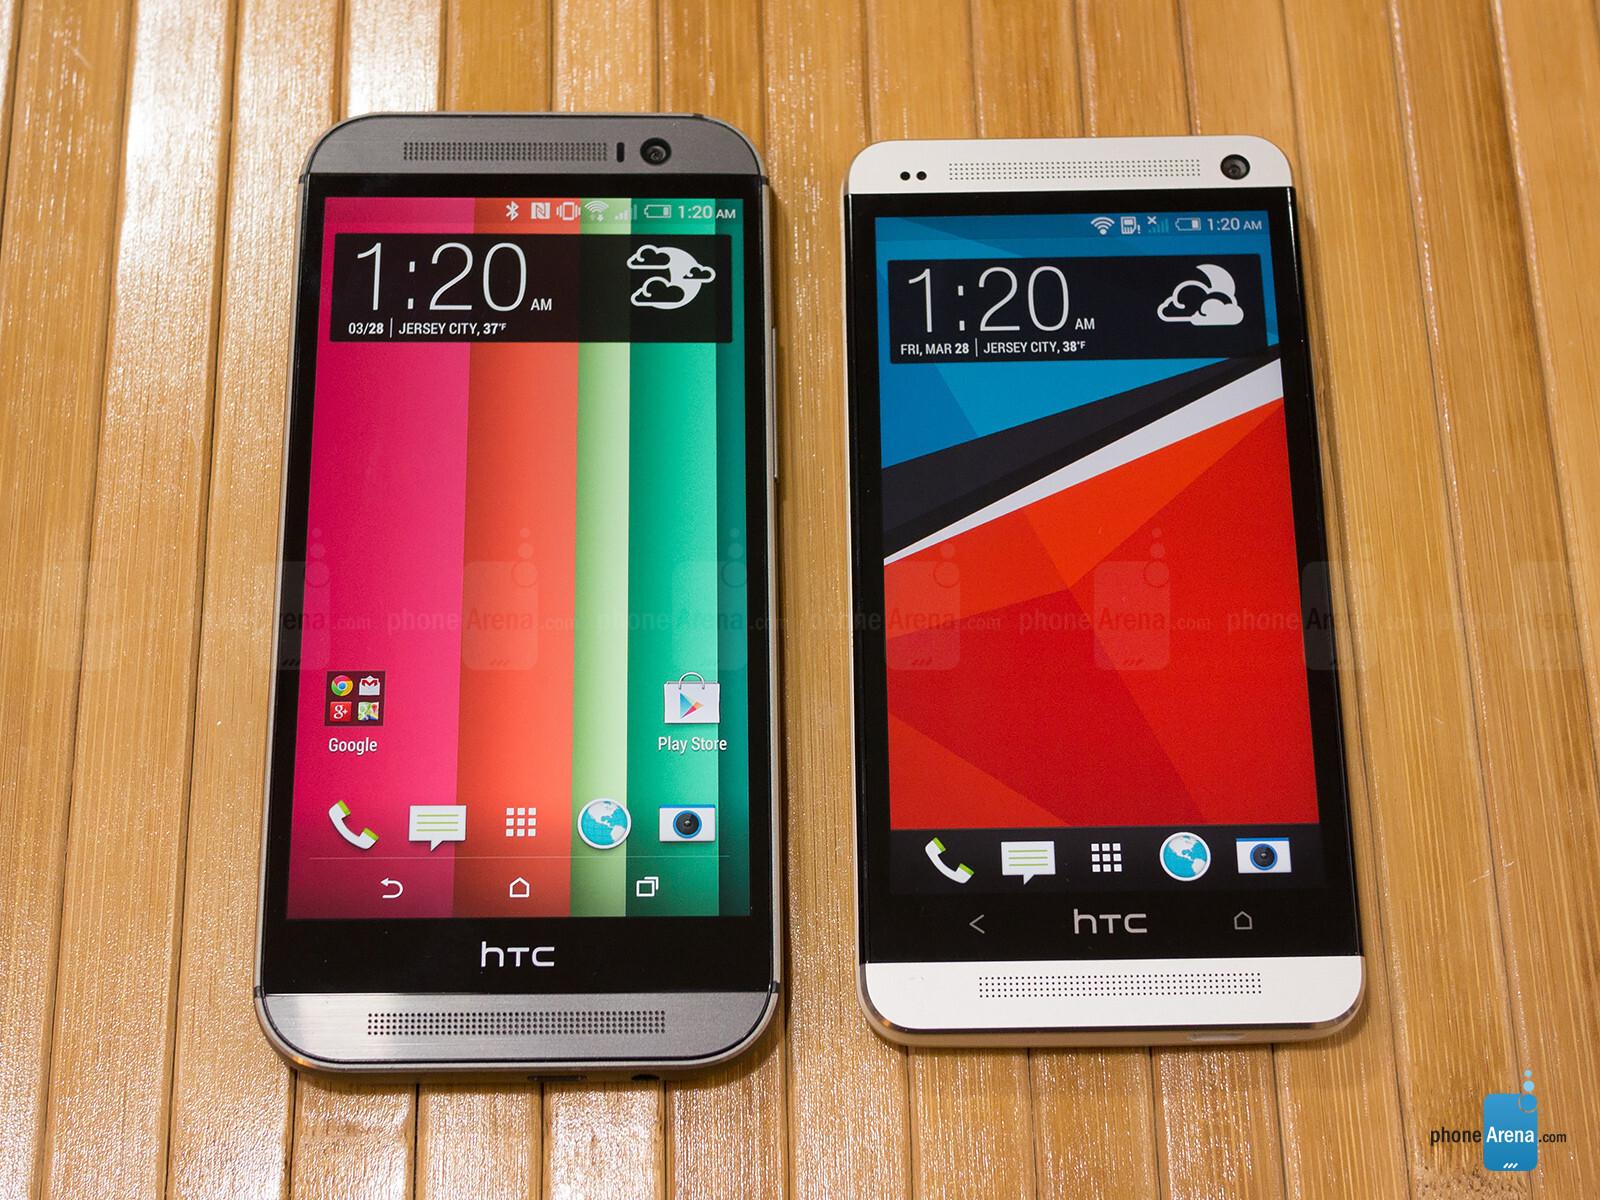 HTC-One-M8-vs-HTC-One-M7-001.jpg